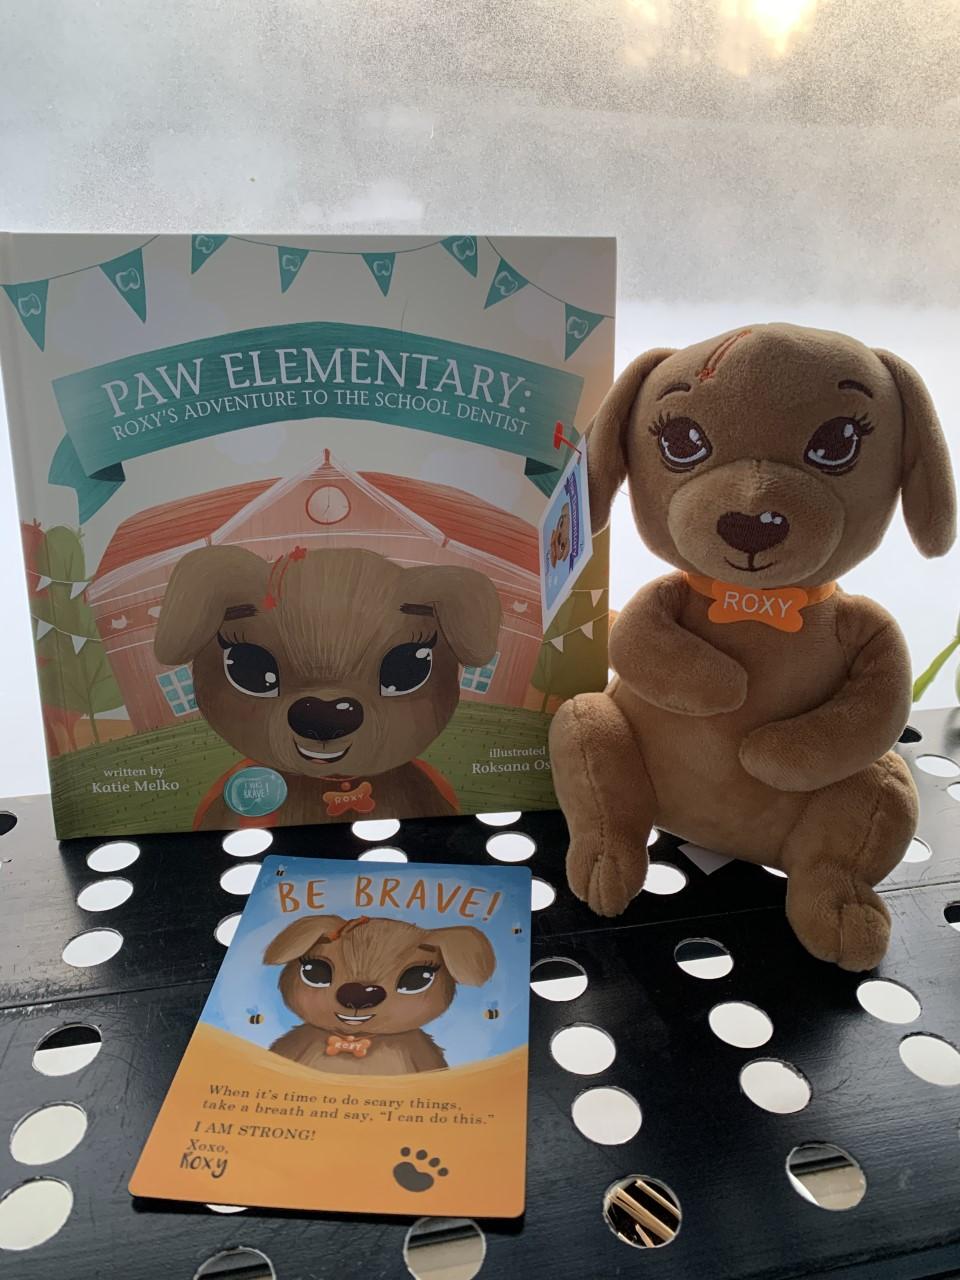 Paw Elementary book, inspiration postcard, Roxy stuffed toy